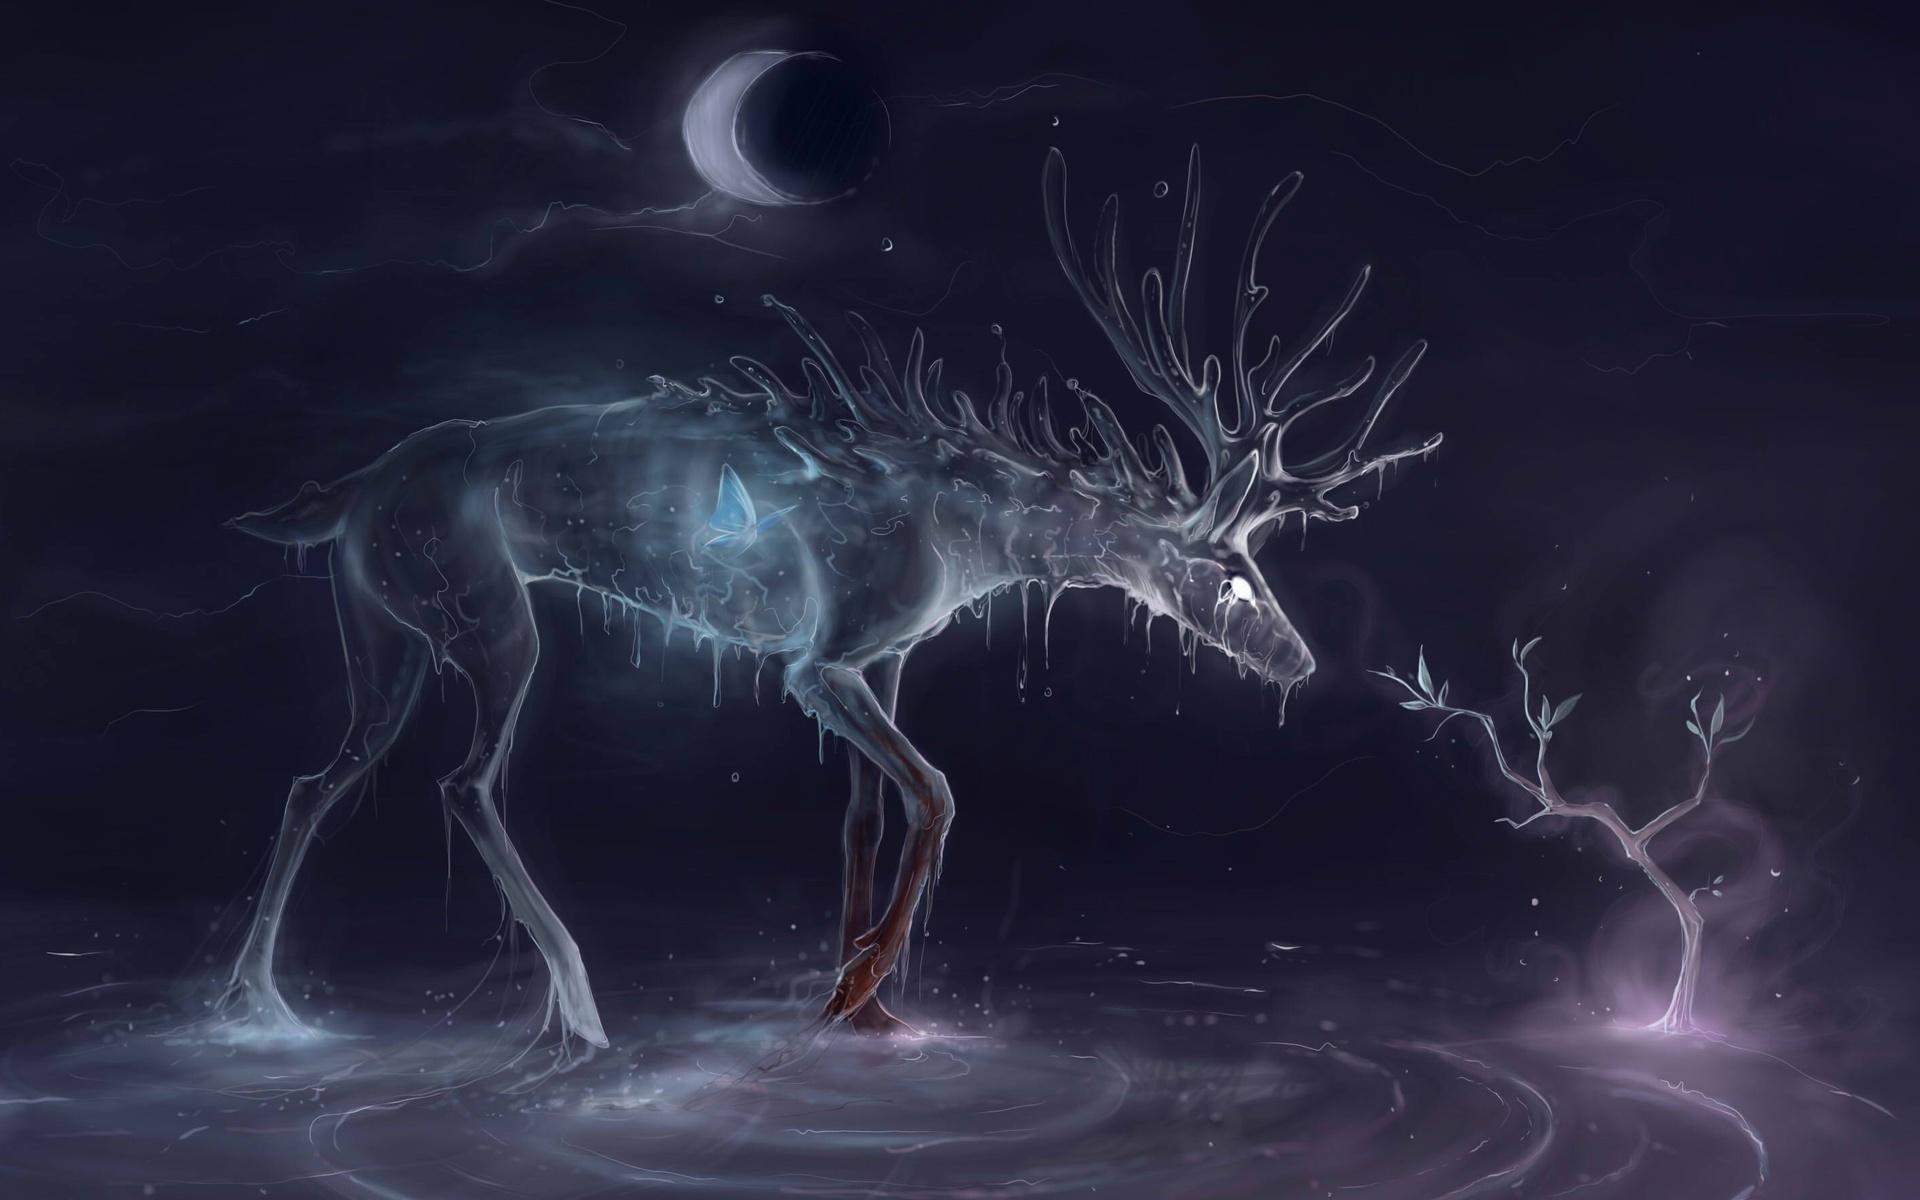 fantasy magic gothic deer animals wallpaper 1920x1200 28607